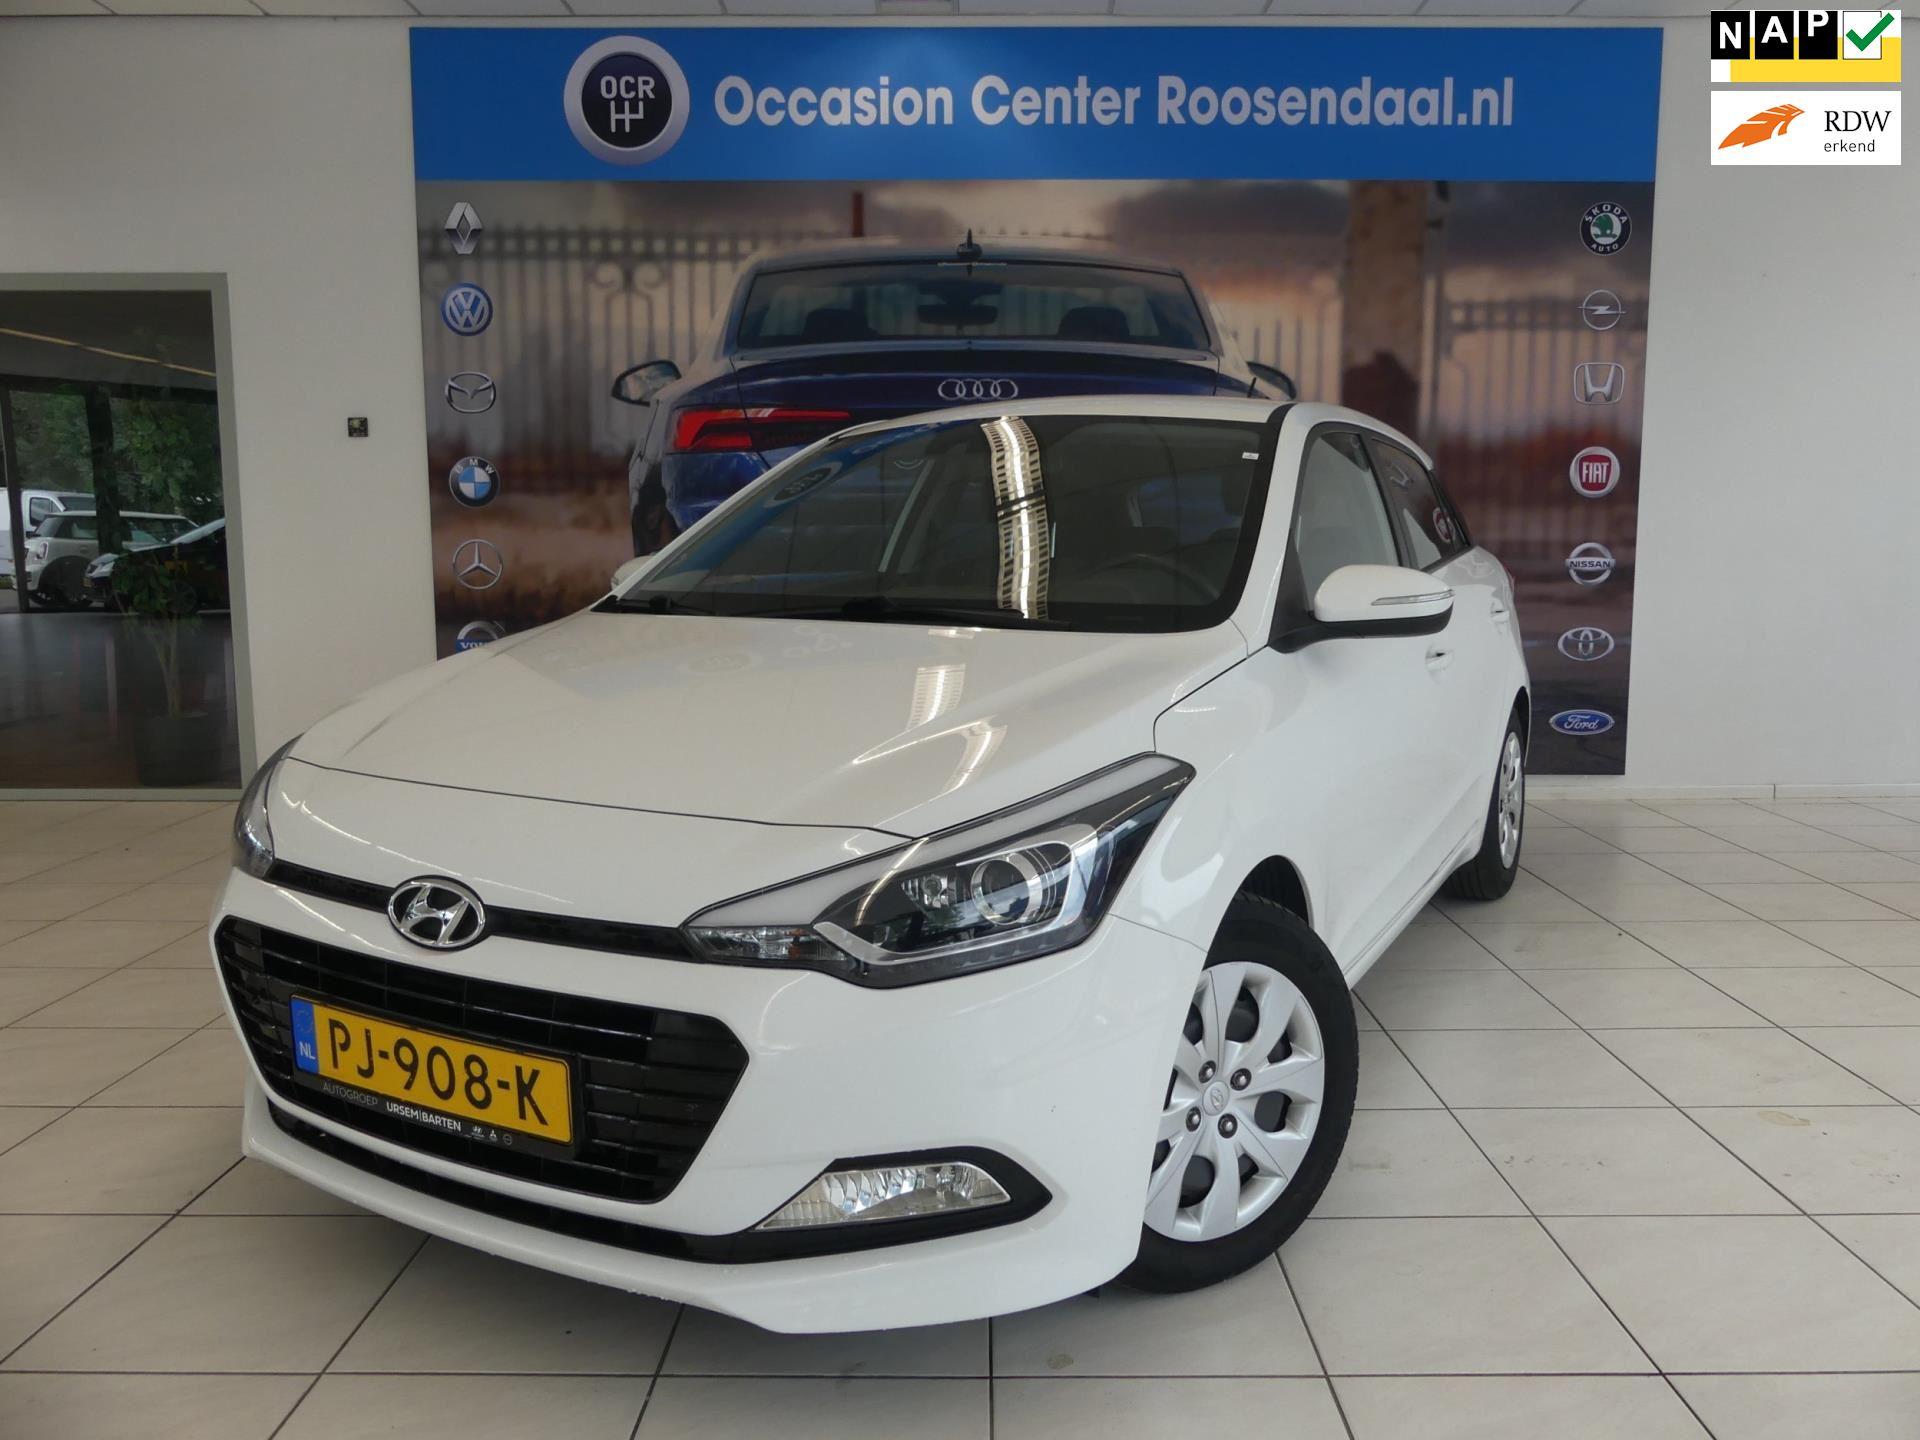 Hyundai I20 occasion - Occasion Center Roosendaal